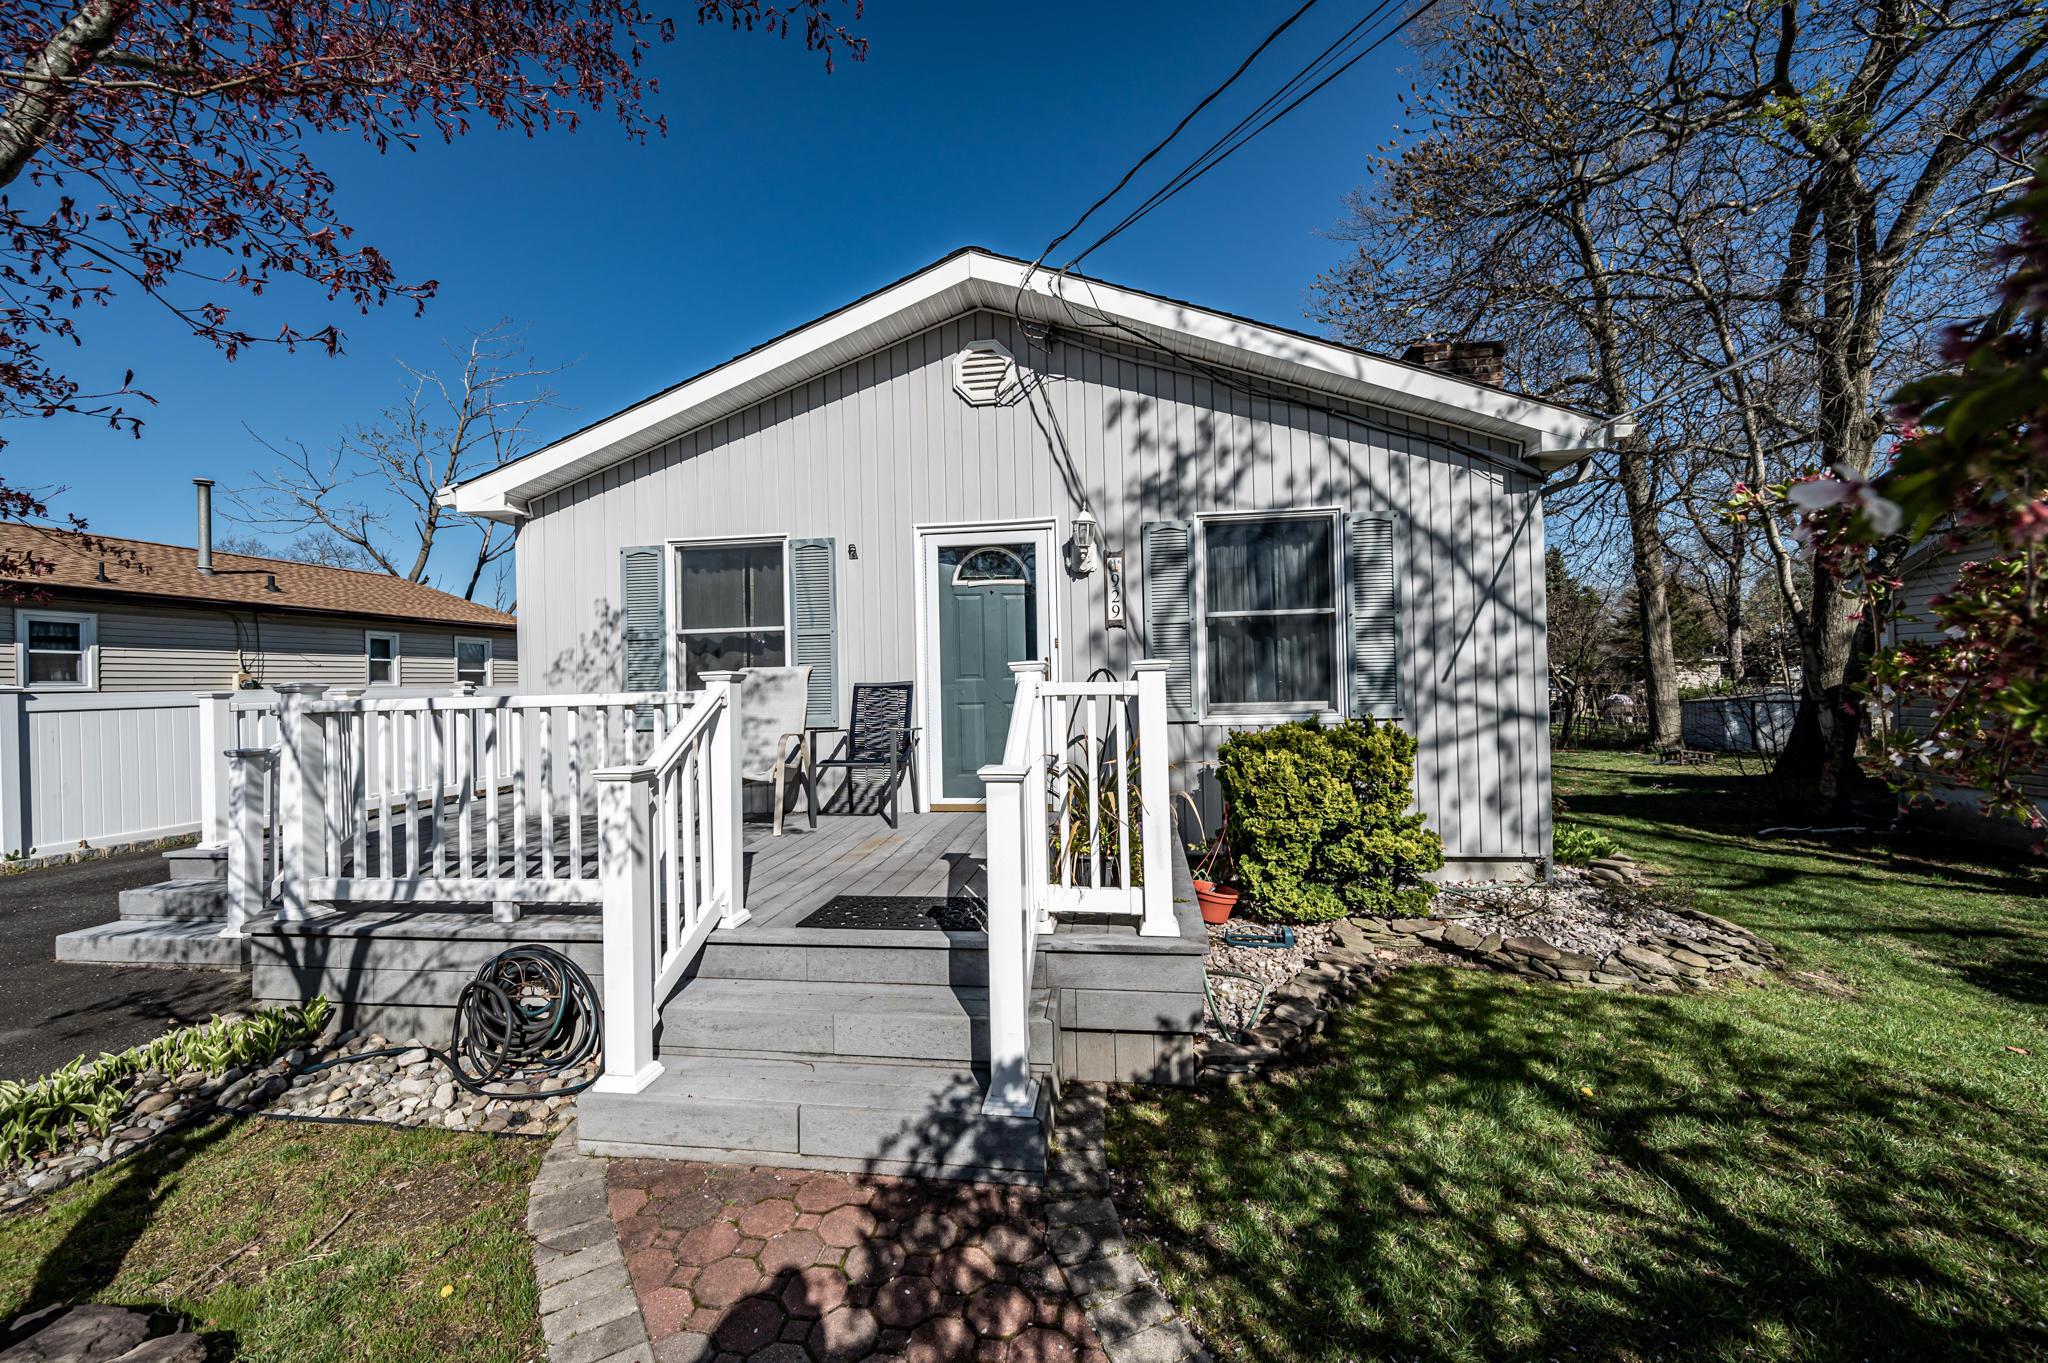 929 Everett Street, Toms River, New Jersey 08753, 3 Bedrooms Bedrooms, ,1 BathroomBathrooms,Single Family,For Sale,929 Everett Street,1,22111255